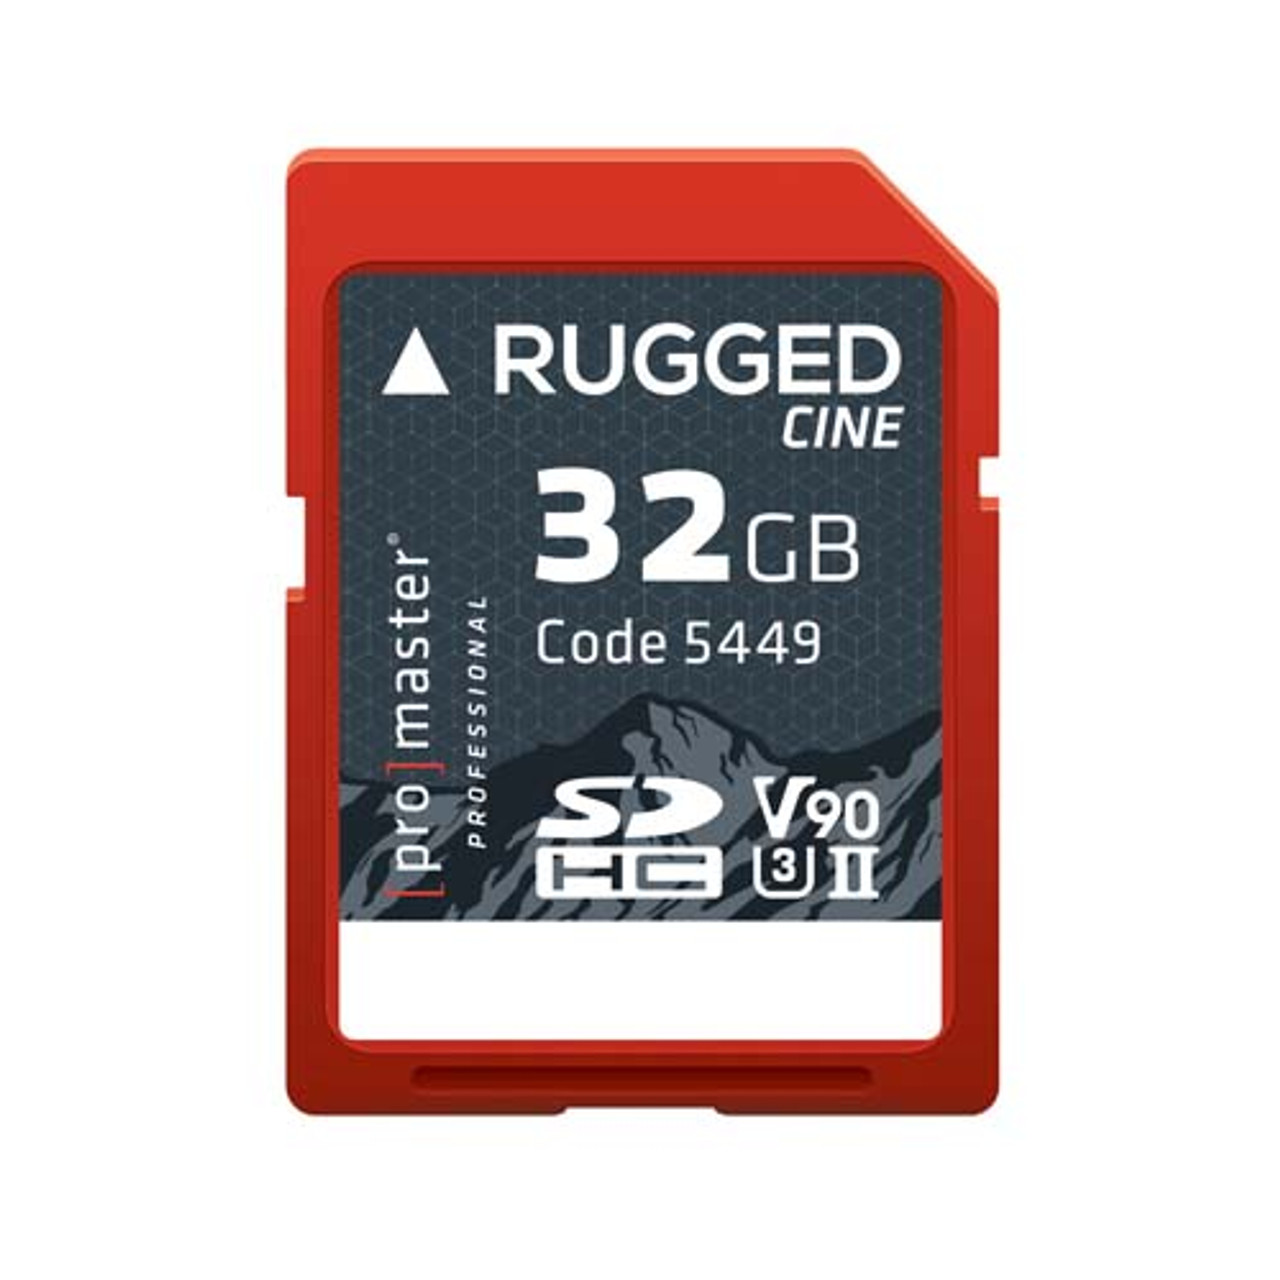 Promaster RUGGED Cine 32gb CINE UHS-II Memory Card